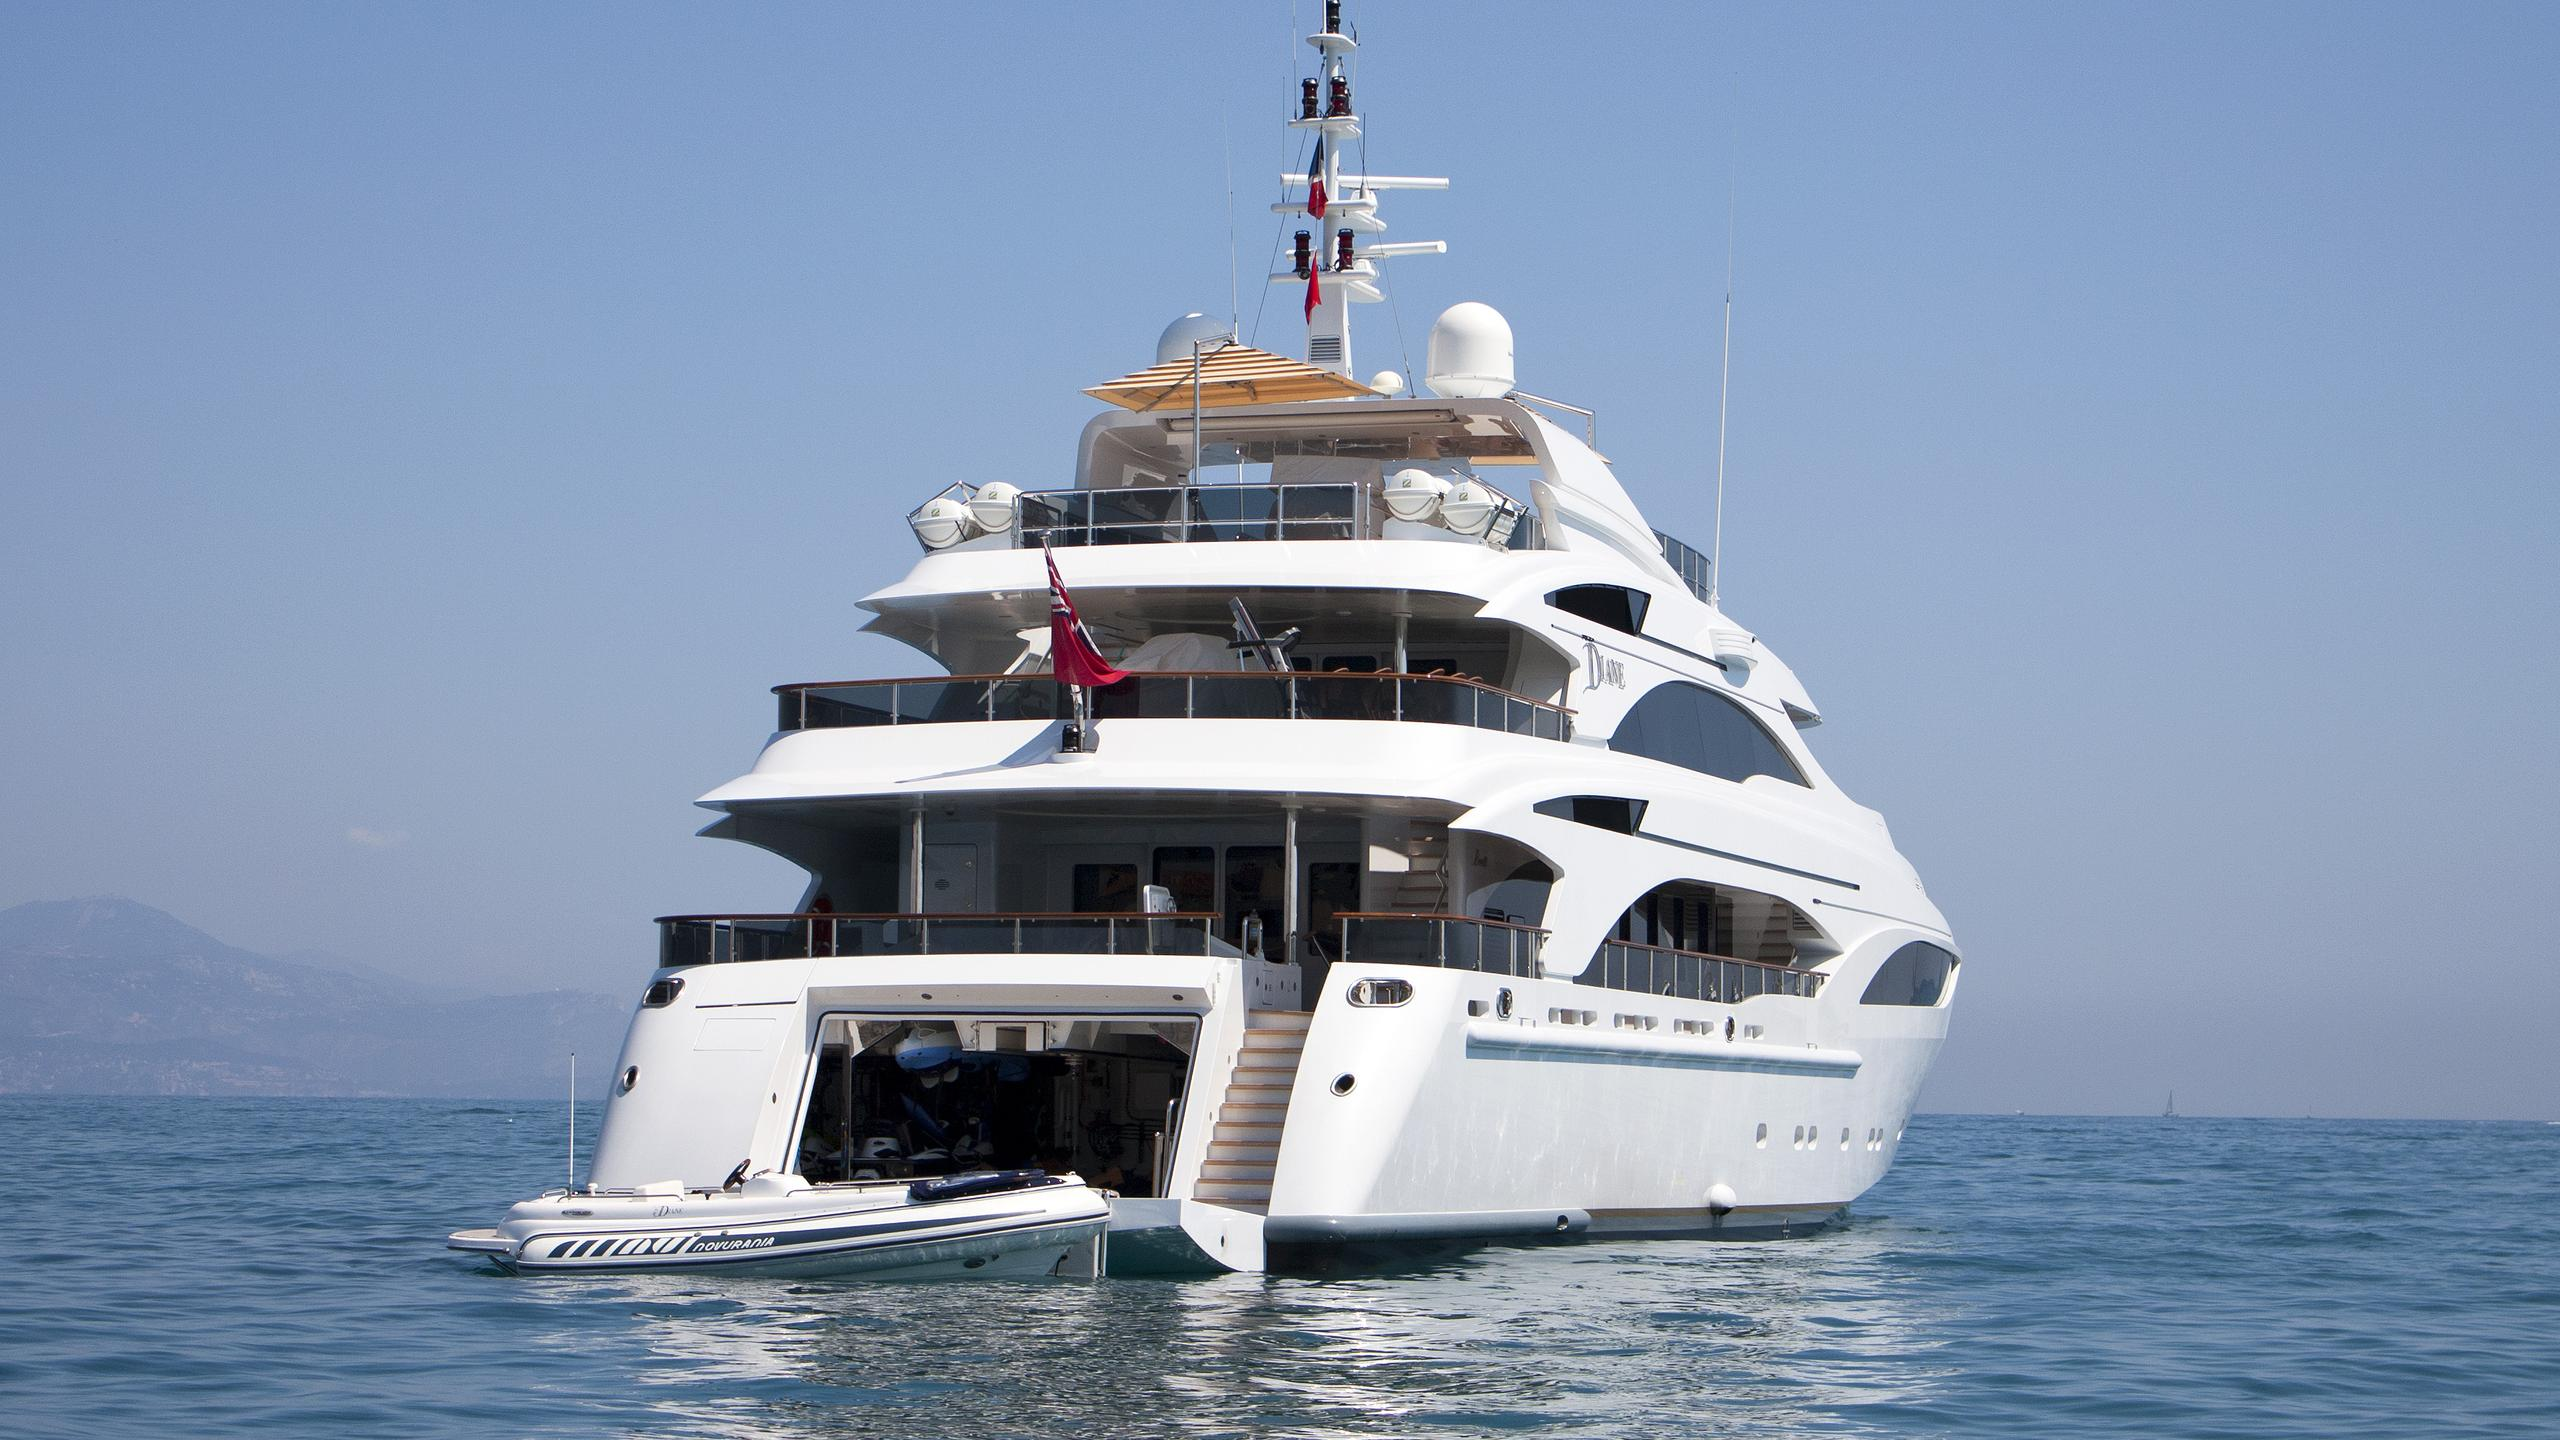 diane-motor-yacht-benetti-2007-43m-stern